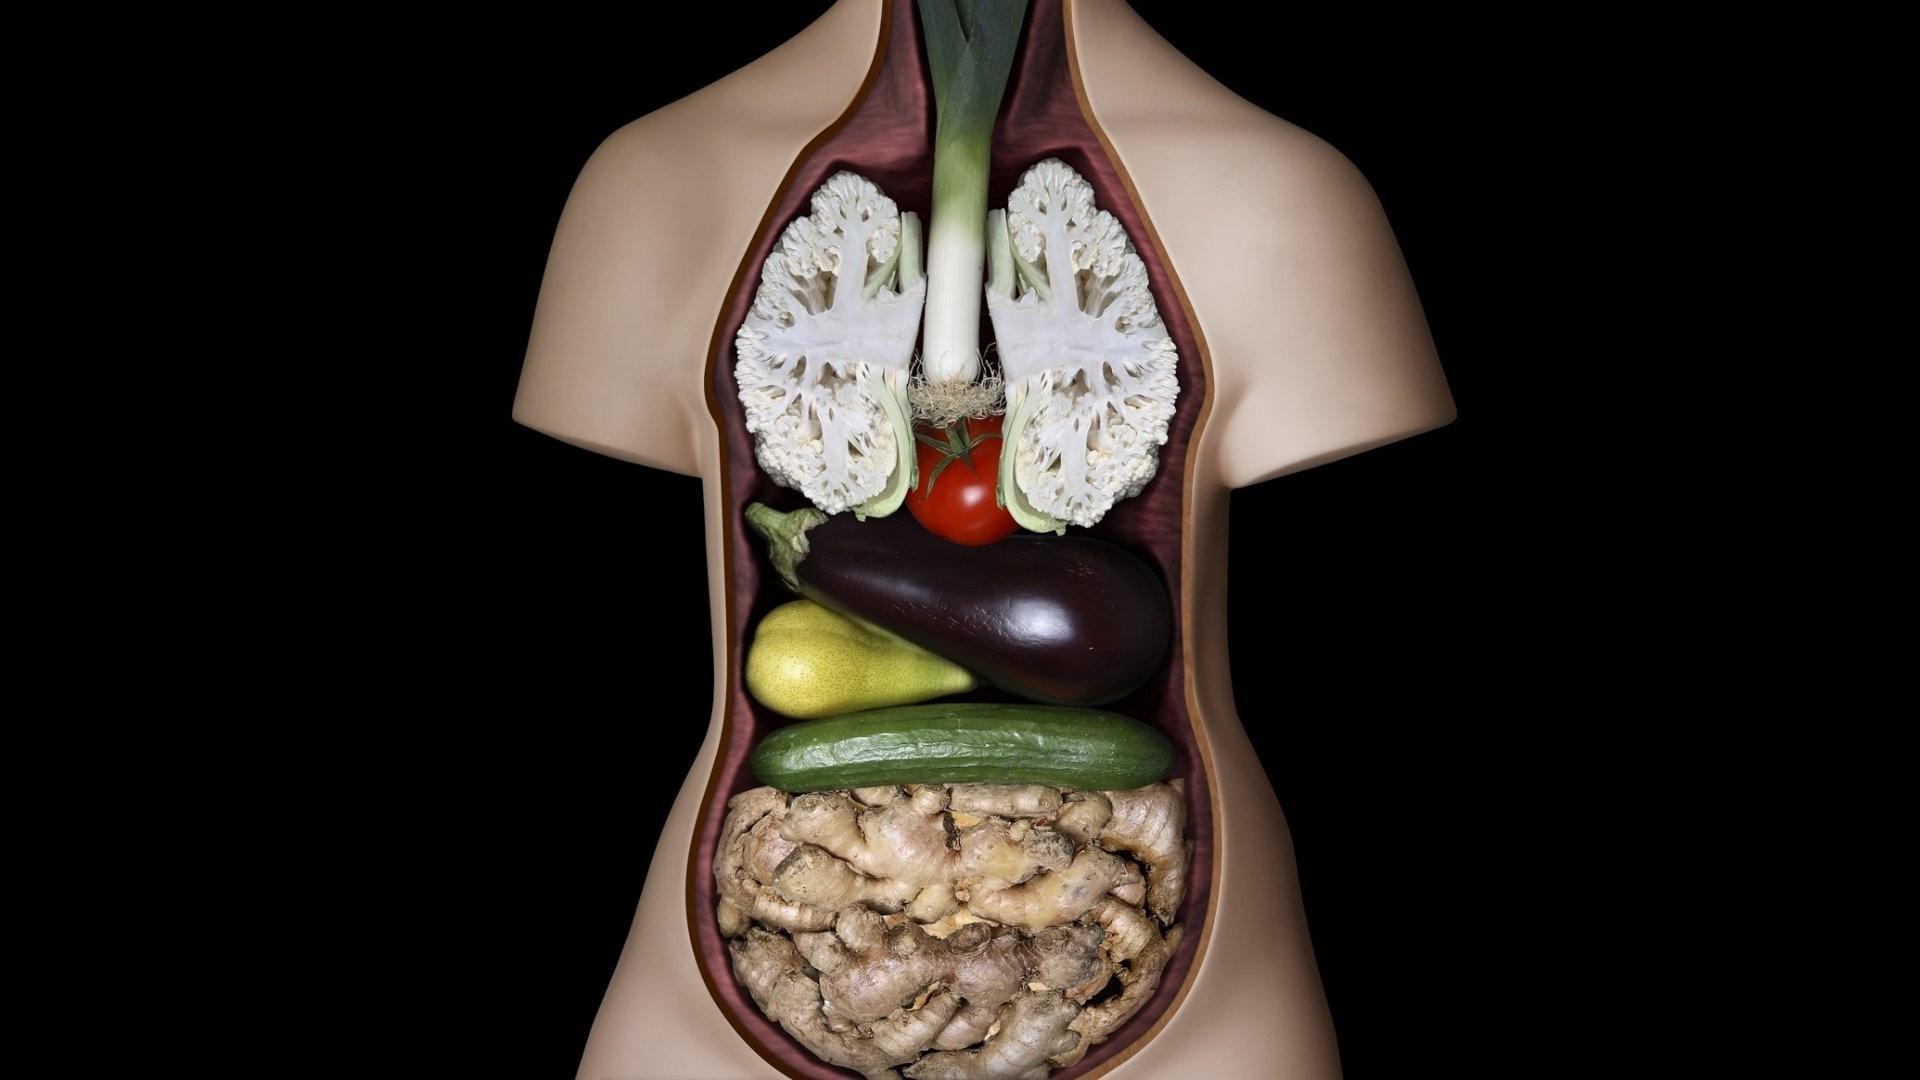 figurines, Vegetables, Guts, Humor, Anatomy Wallpapers HD / Desktop and  Mobile Backgrounds